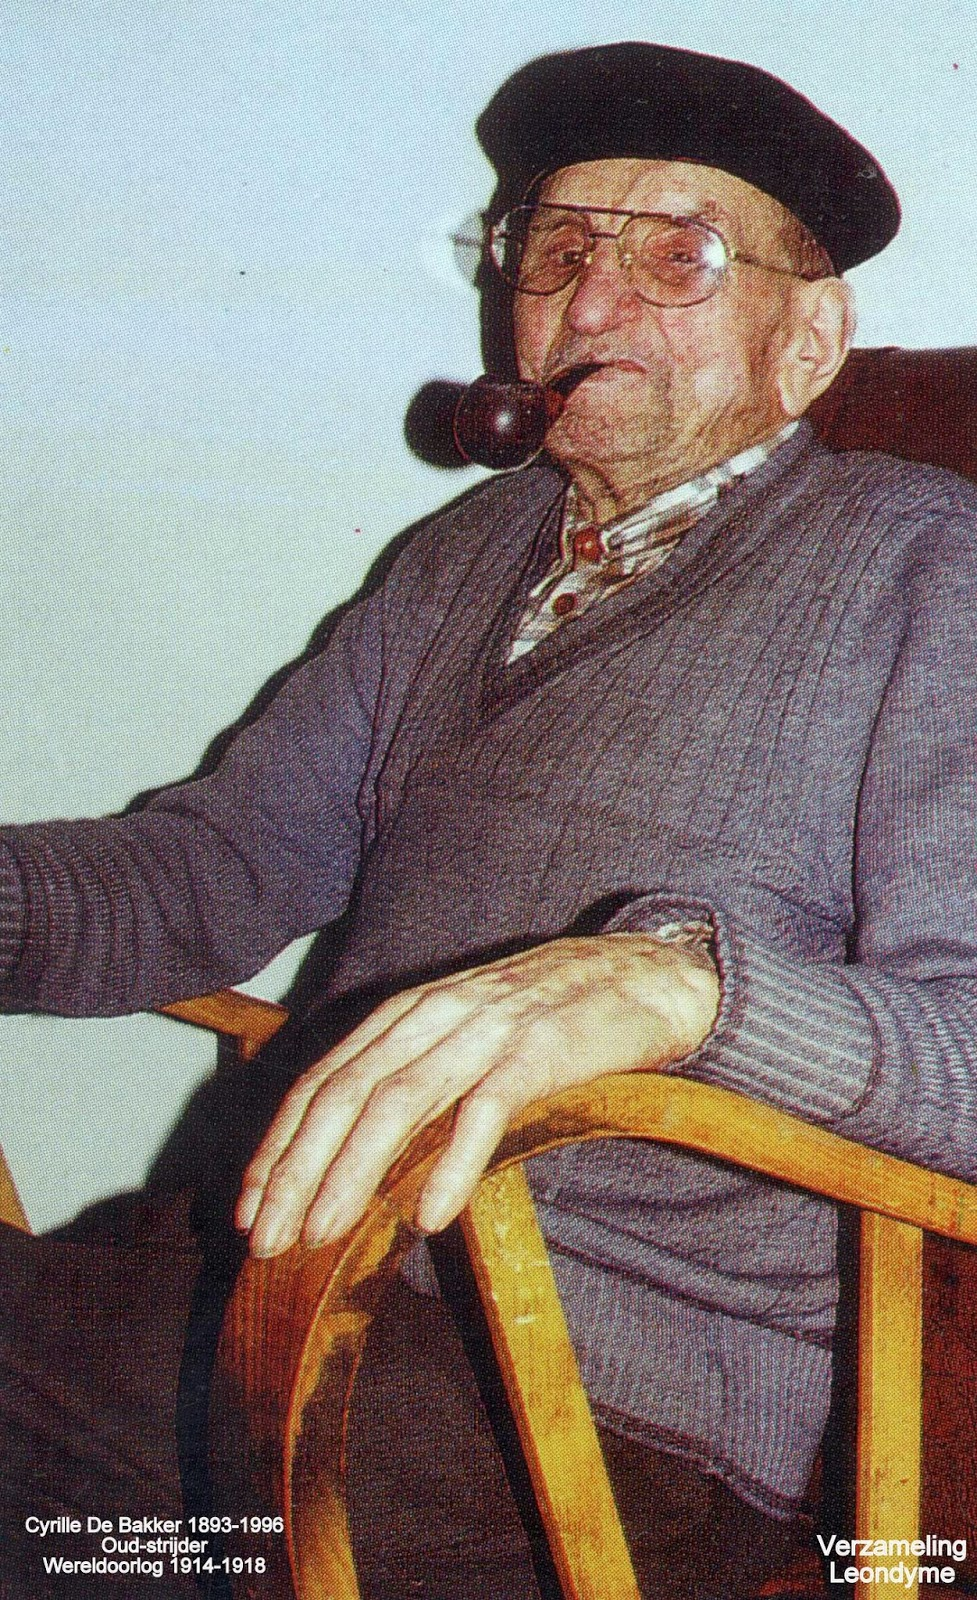 Cyrille De Bakker op honderdjarige leeftijd. Verzameling Leondyme.